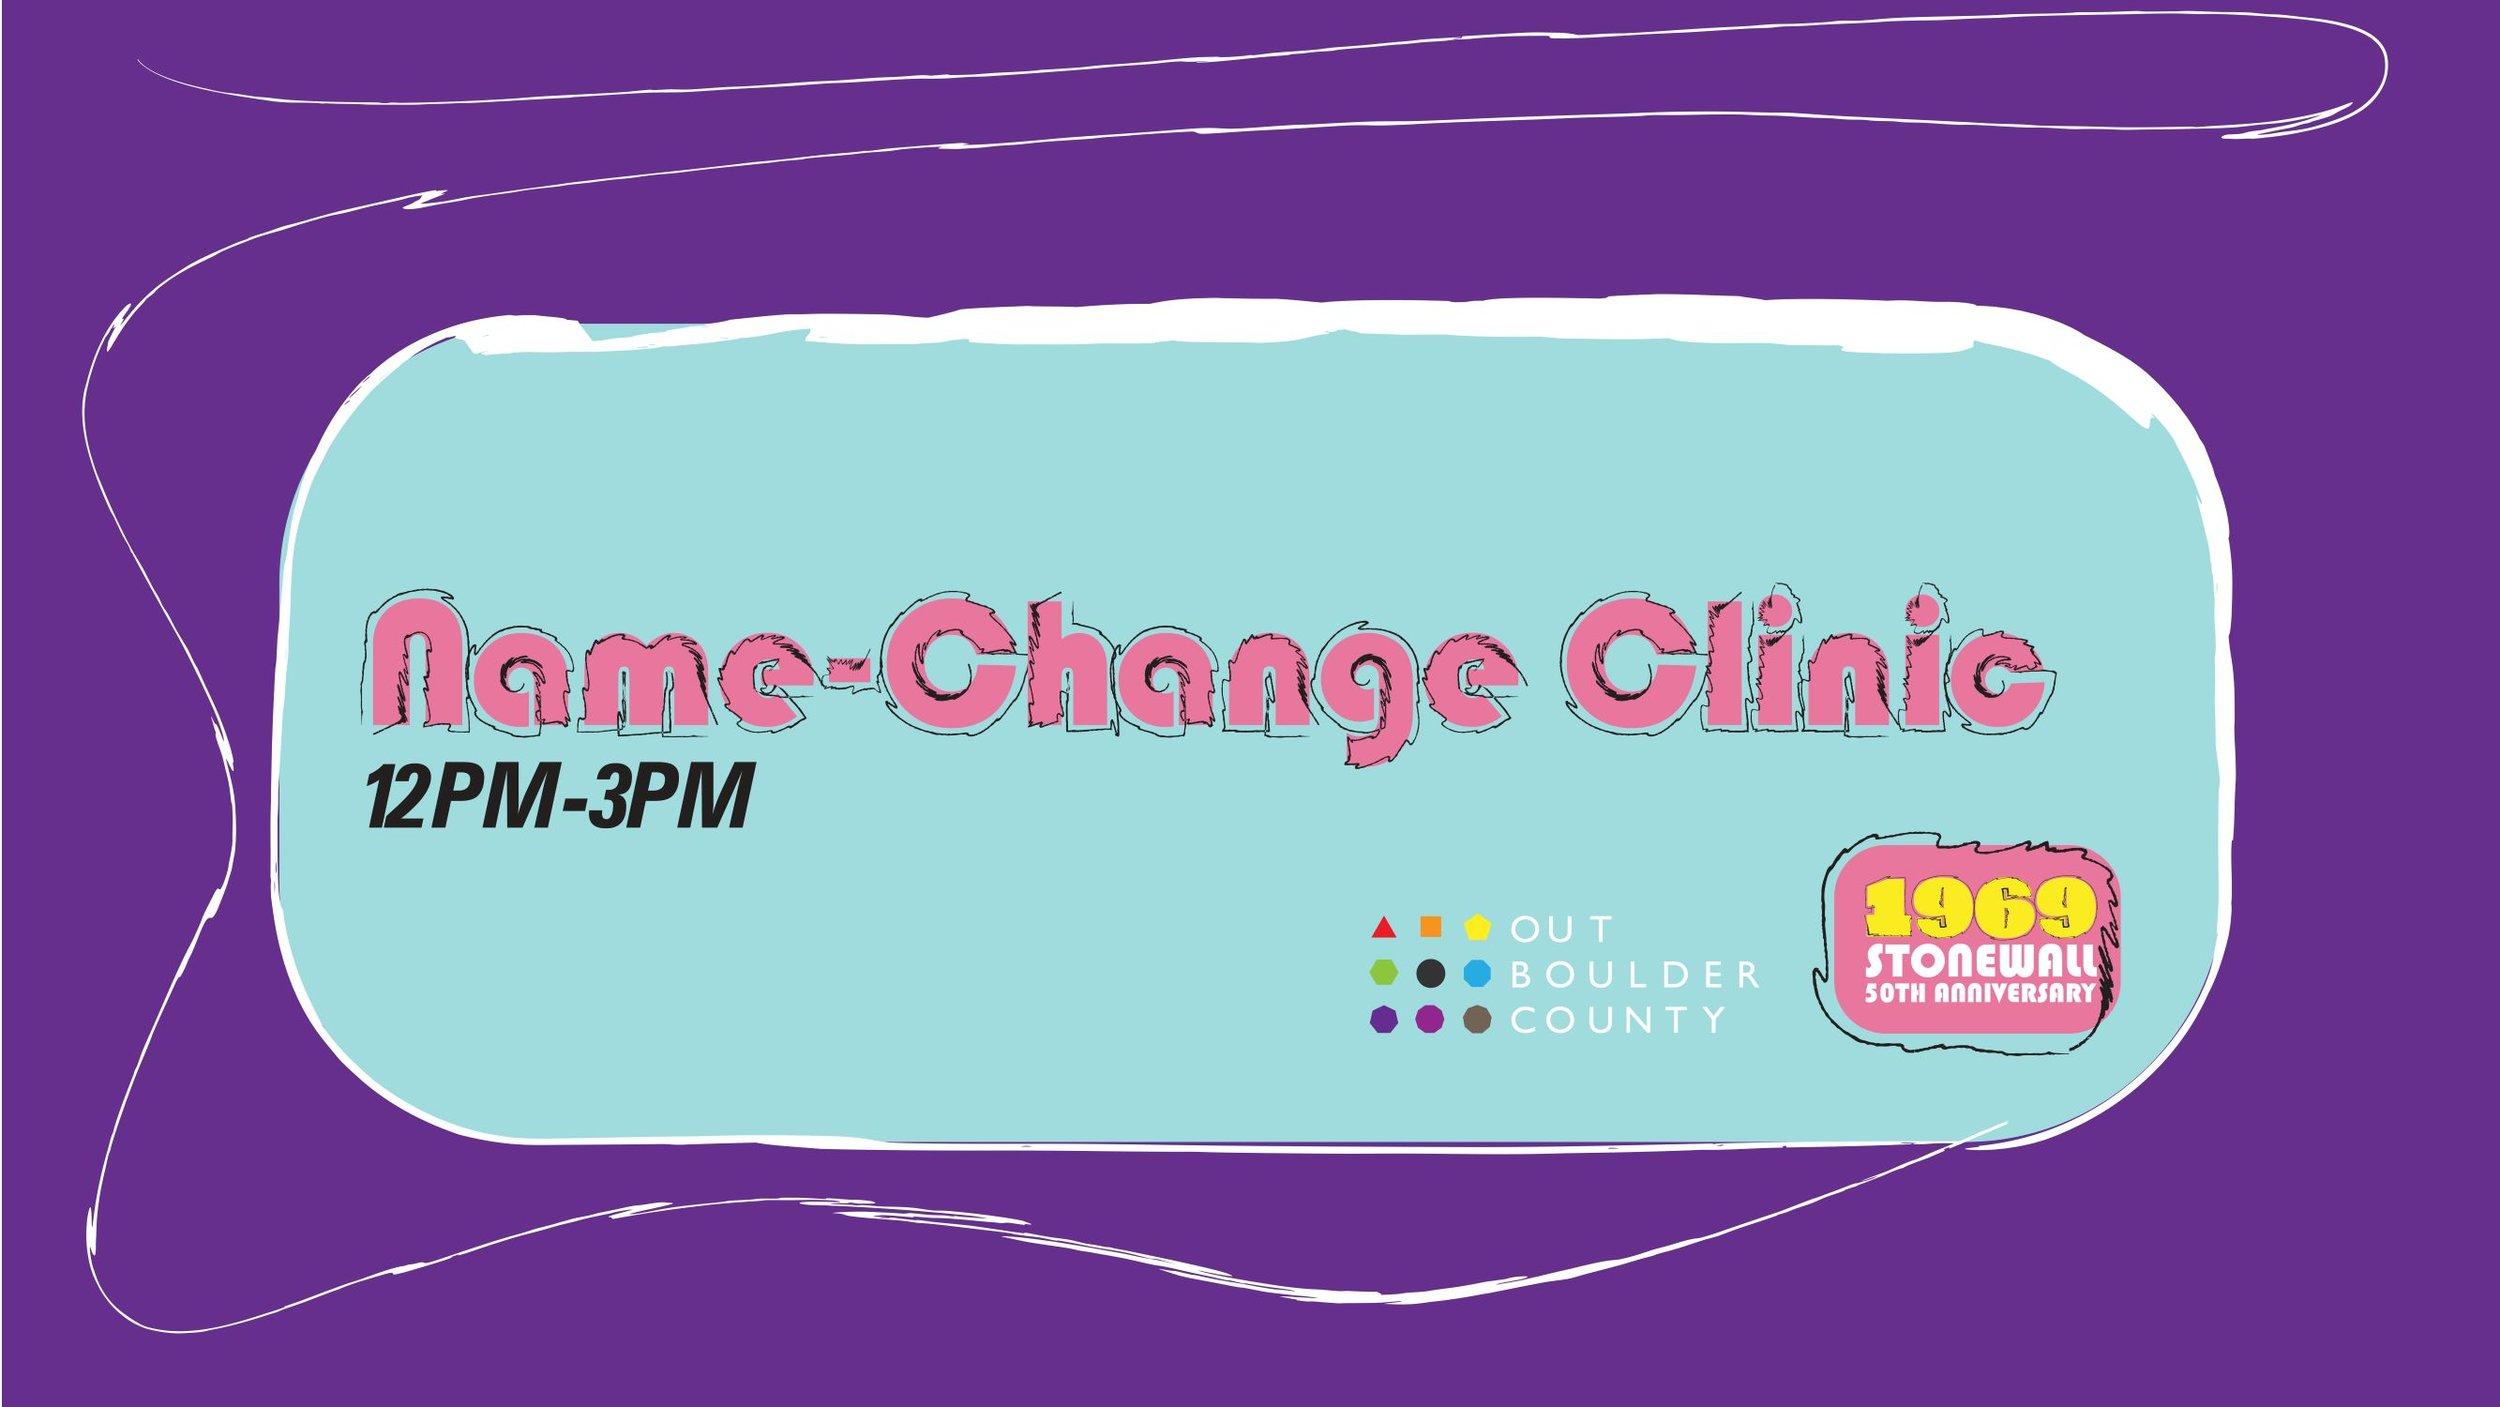 Name change clinic_min_L.jpg